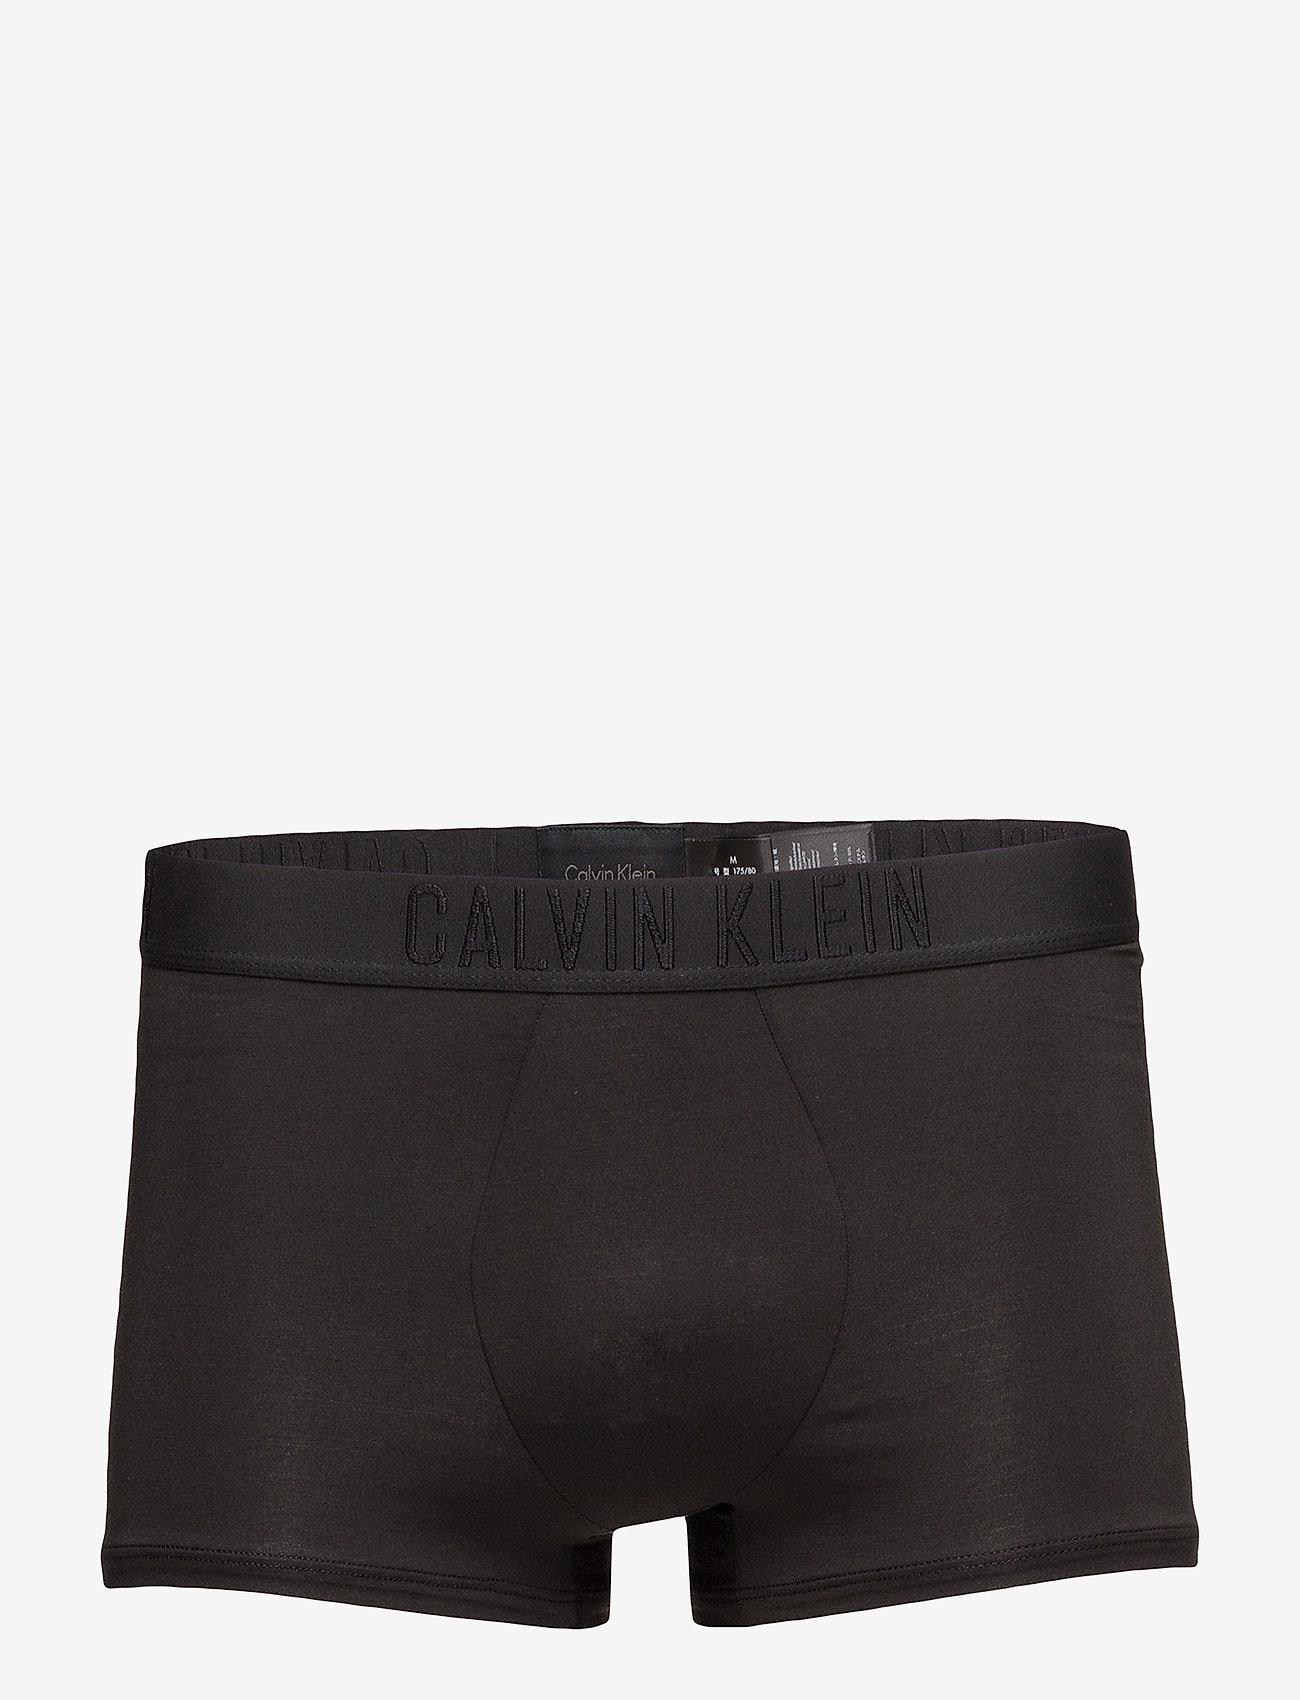 Calvin Klein - TRUNK - boxershorts - black - 0